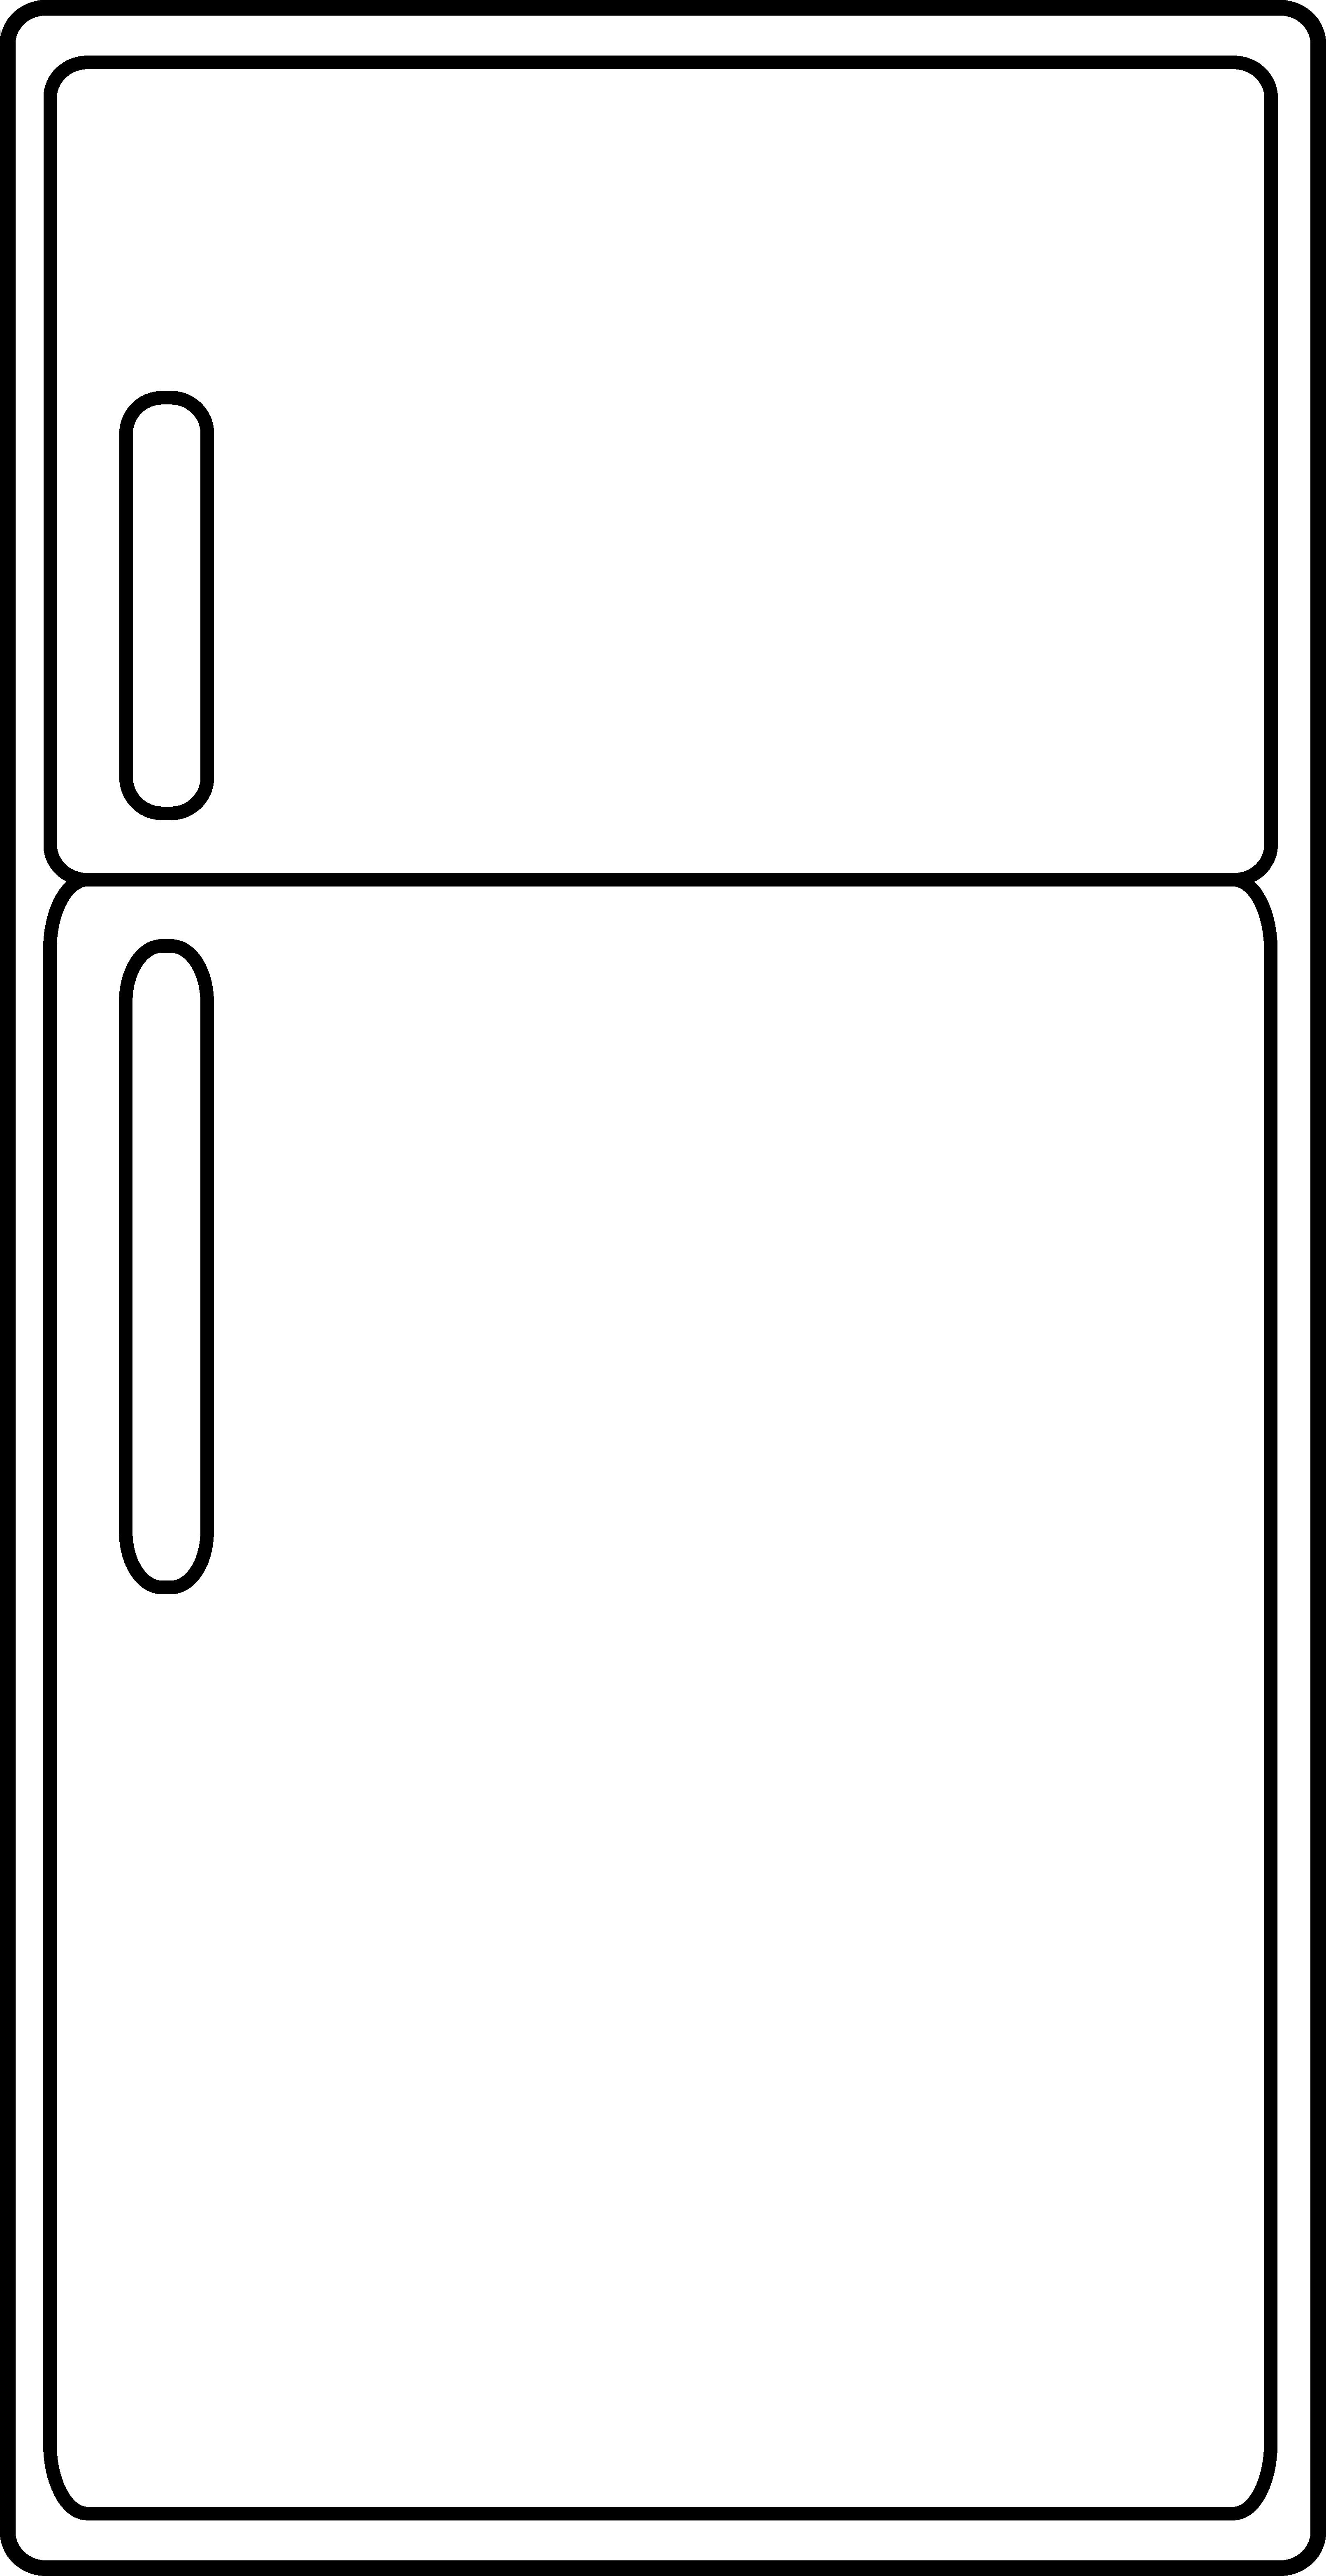 Free Vintage Refrigerator Cliparts, Download Free Clip Art.